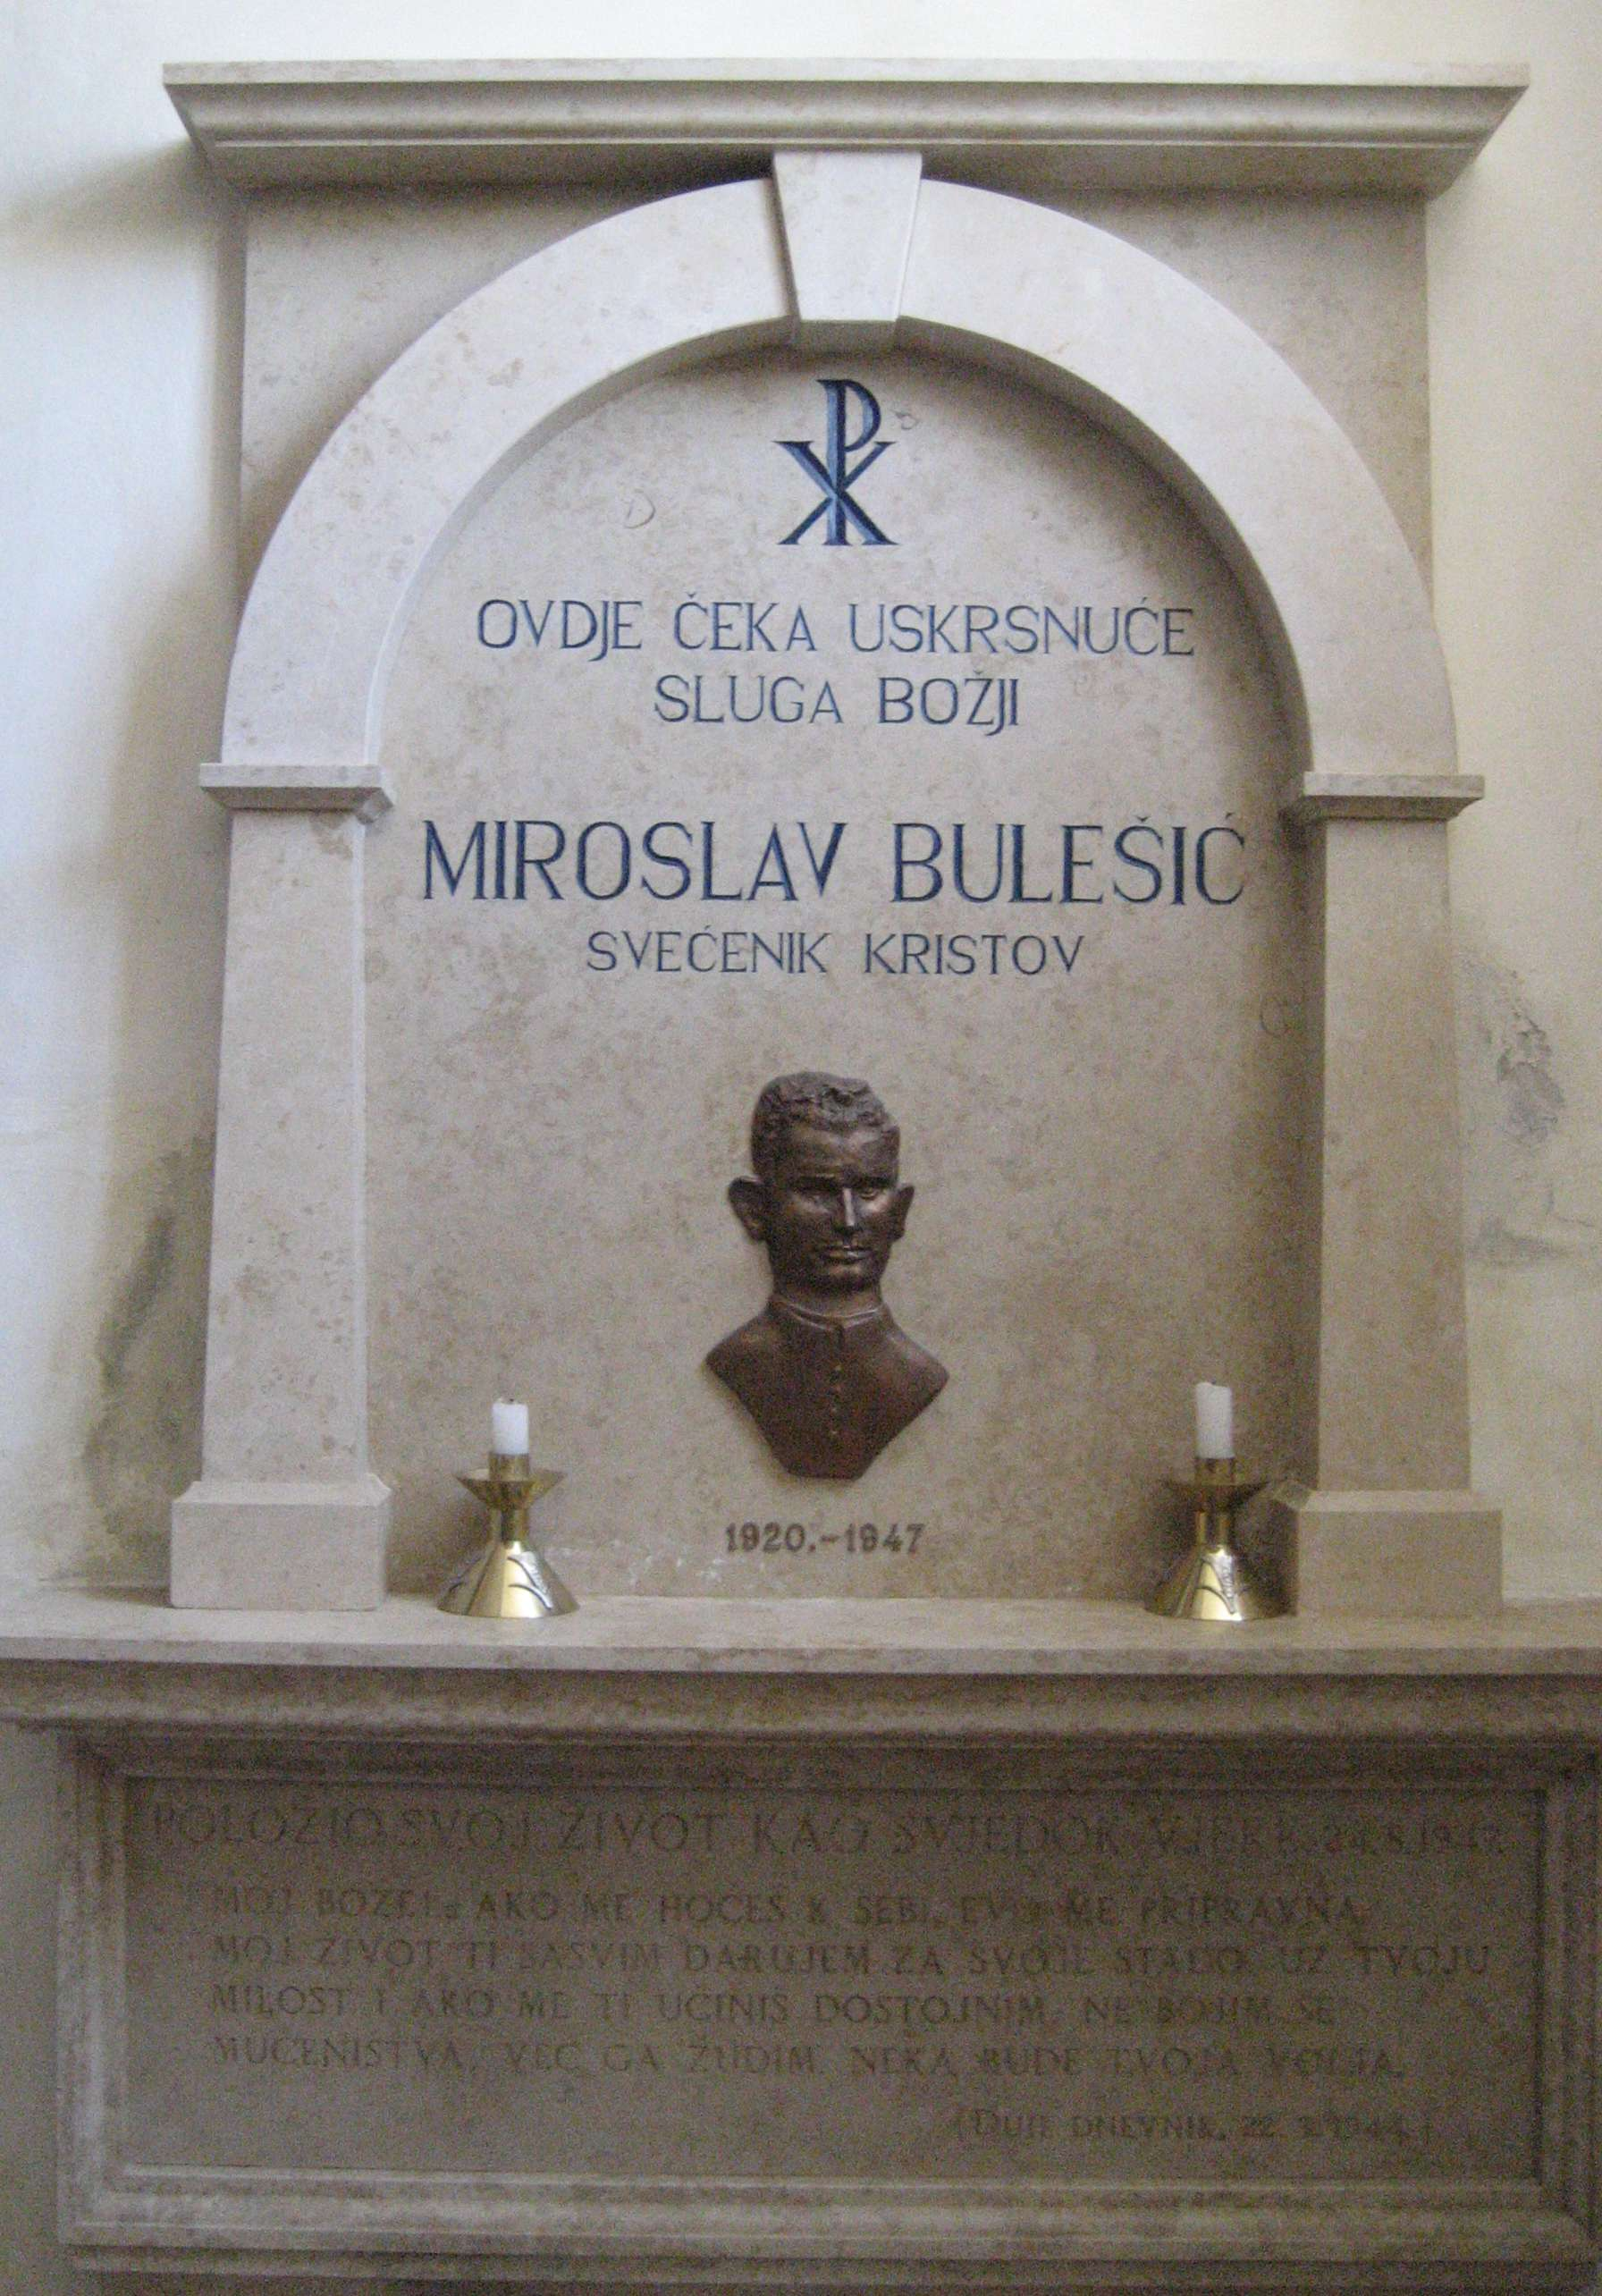 http://hrvatskifokus-2021.ga/wp-content/uploads/2015/05/Spomenik_Miroslav_Bulesic-scaled.jpg